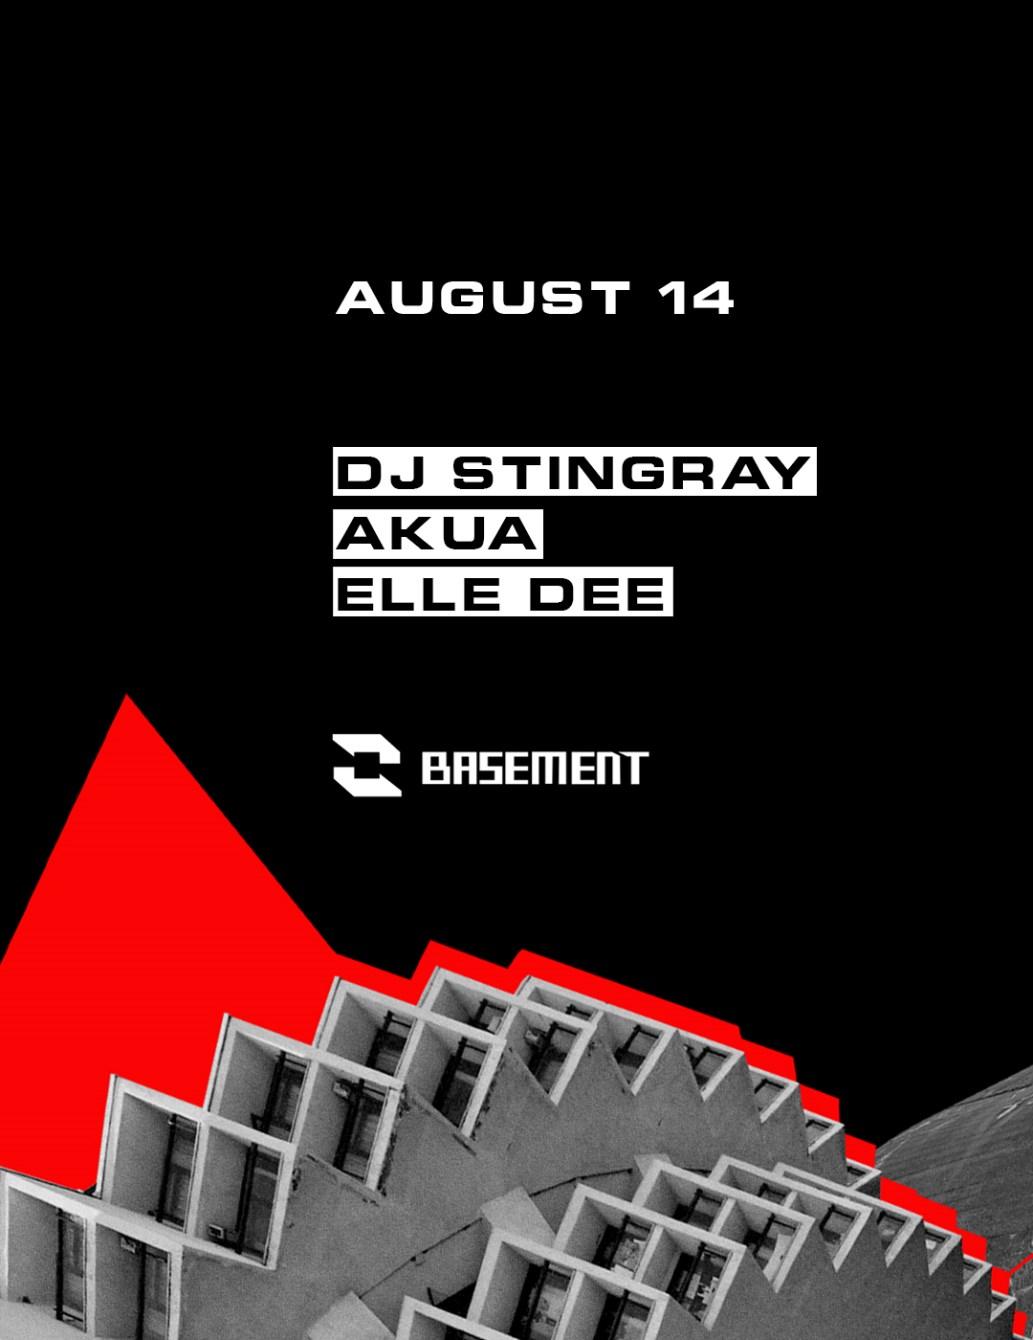 DJ Stingray / Akua / Elle Dee - Flyer front